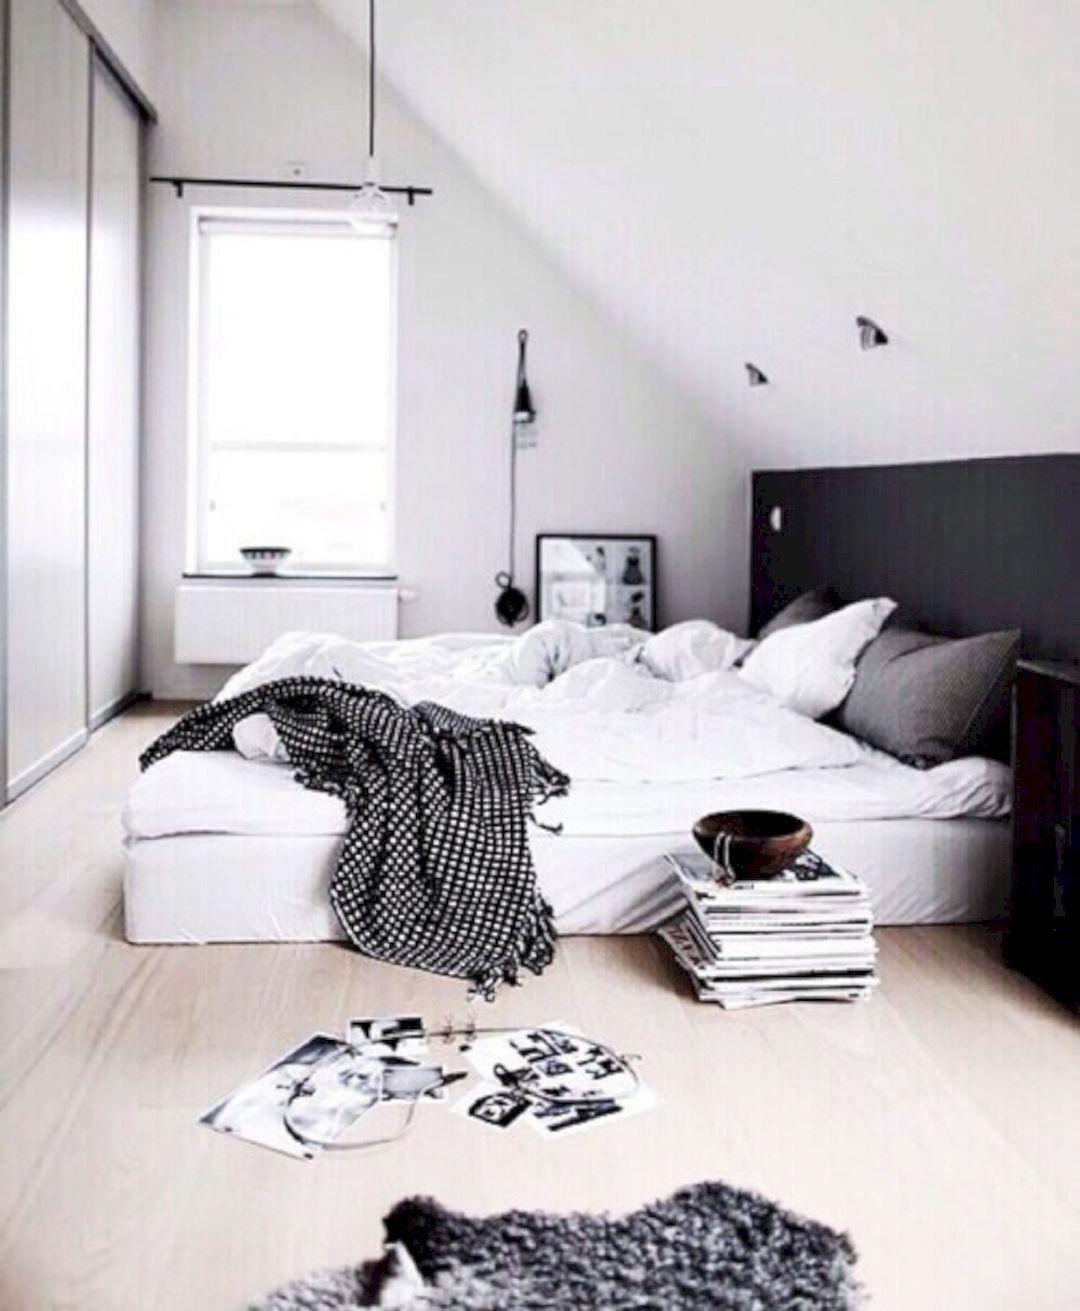 Stunning Modern Home Decor Ideas | Modern, Interiors and Attic on